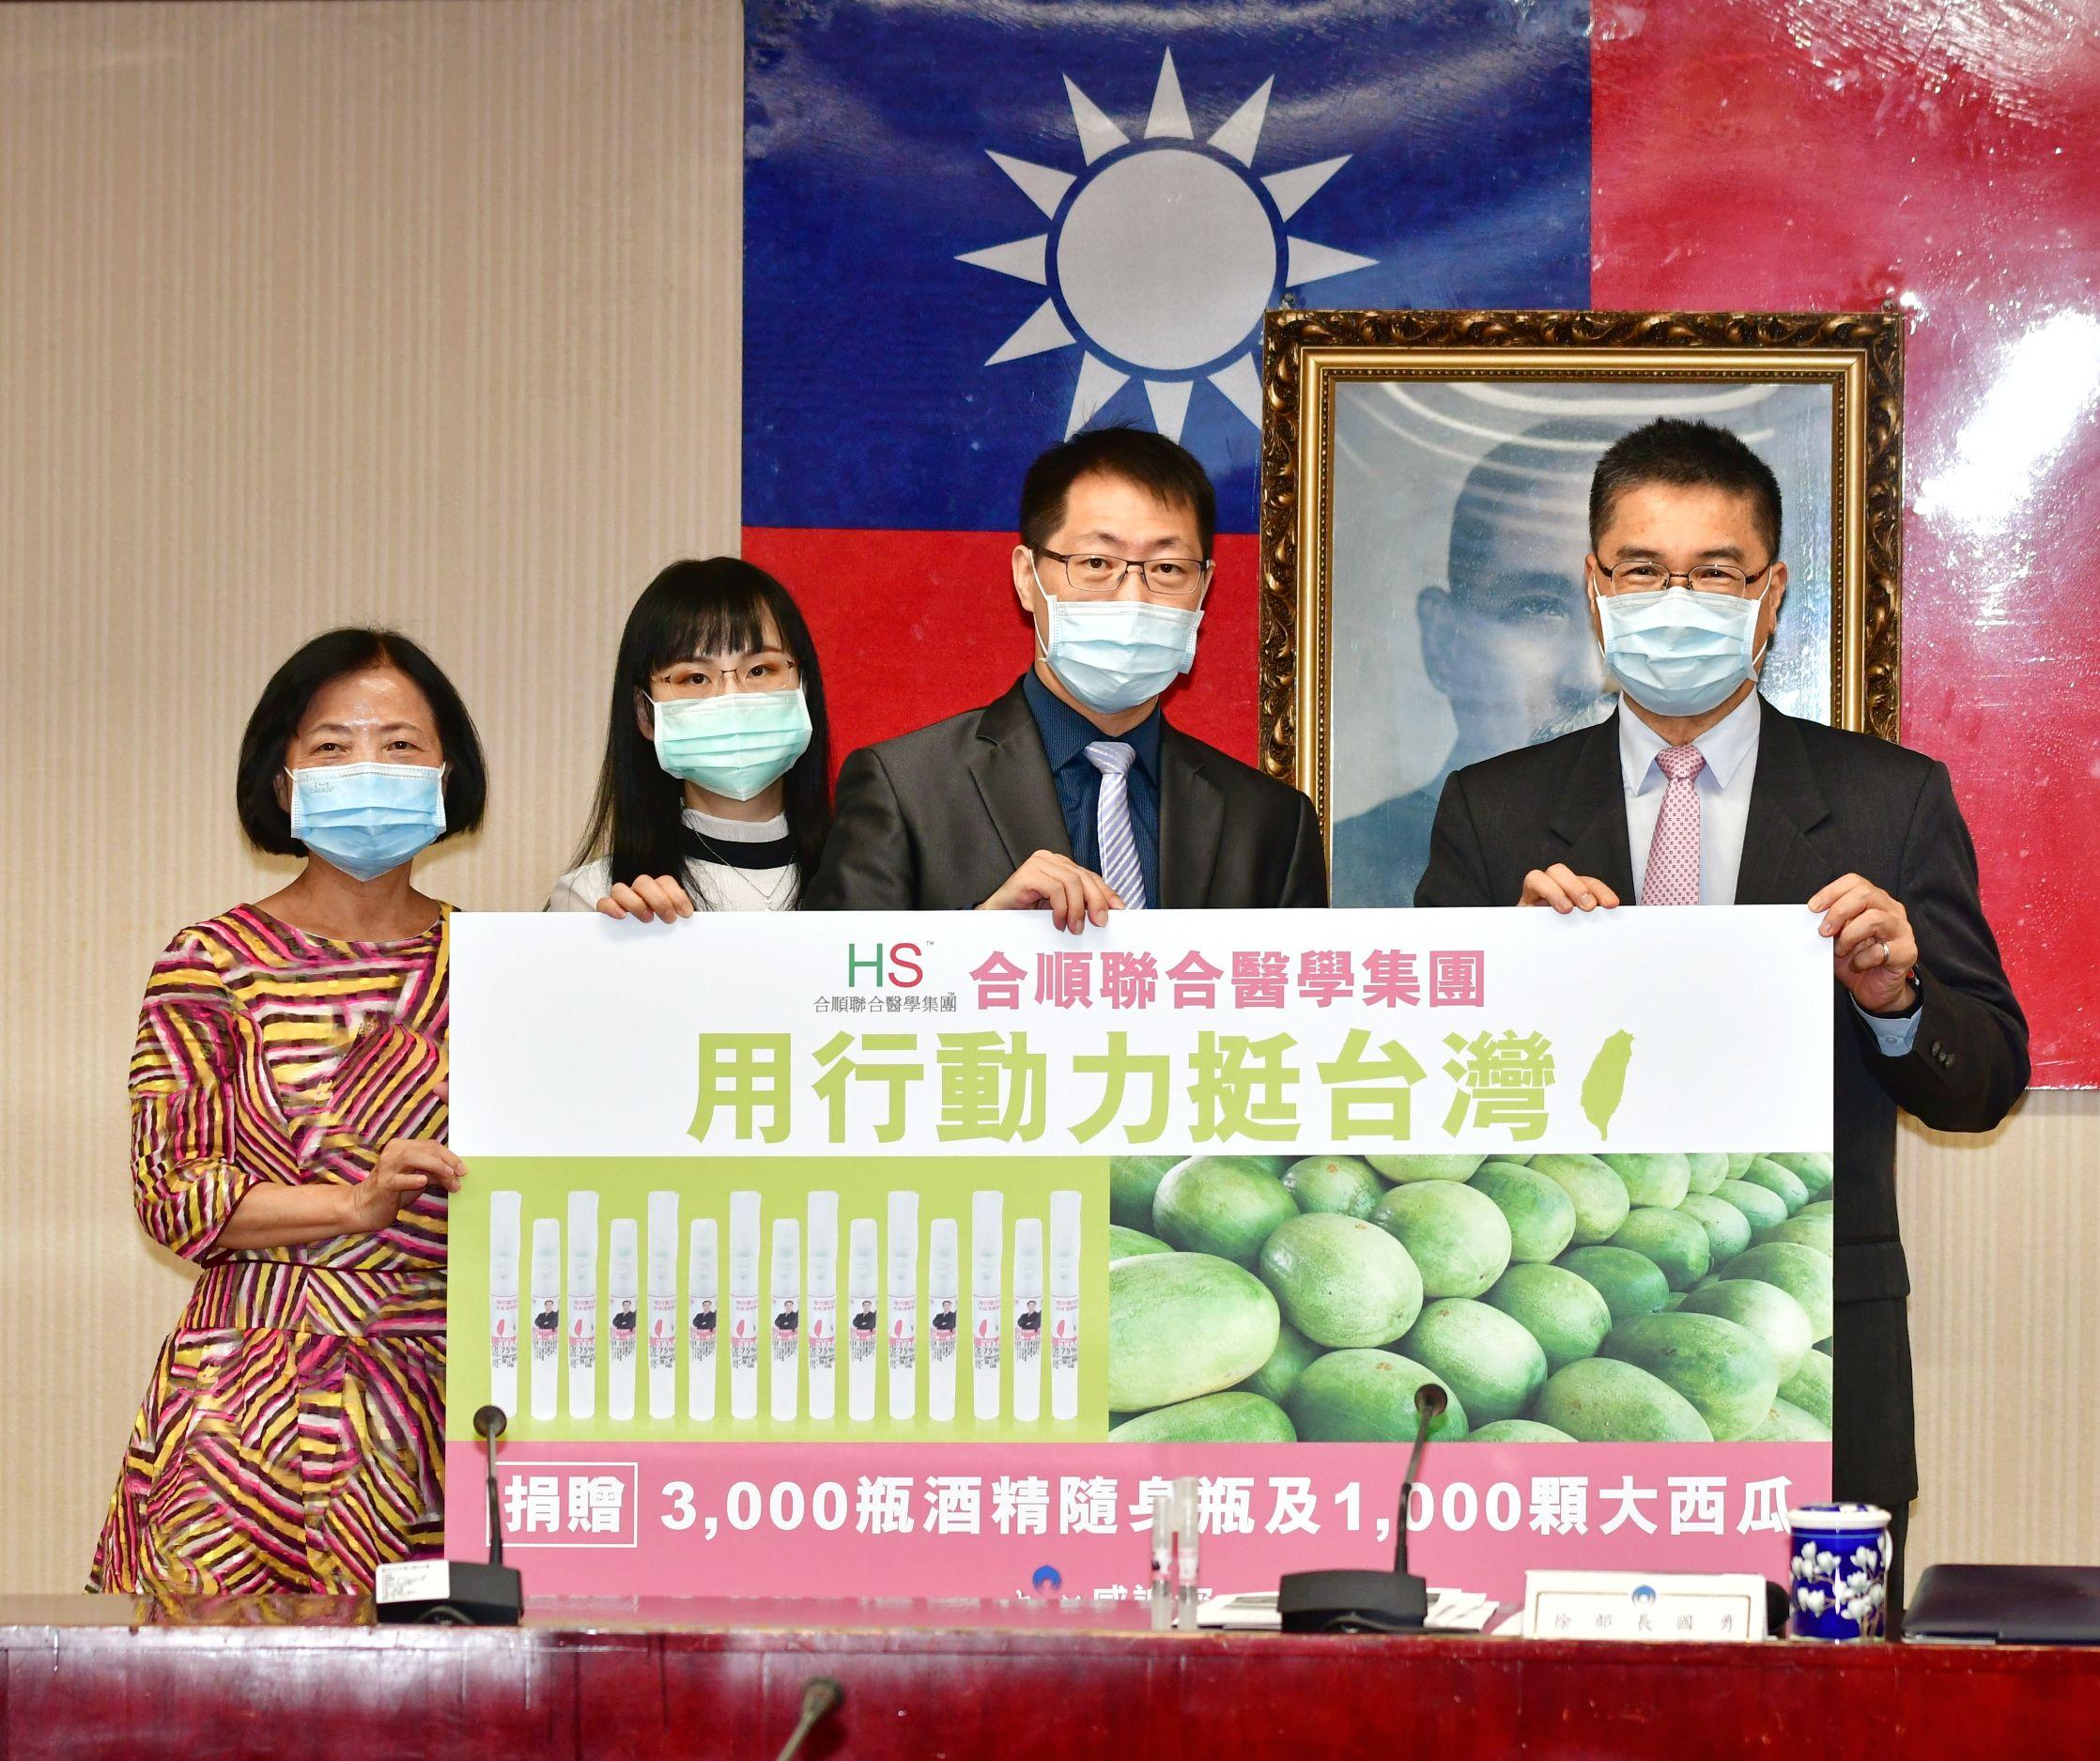 HS合順聯合醫學集團執行長張凱翔(右2)捐贈防疫酒精及認購西瓜捐第一線安全